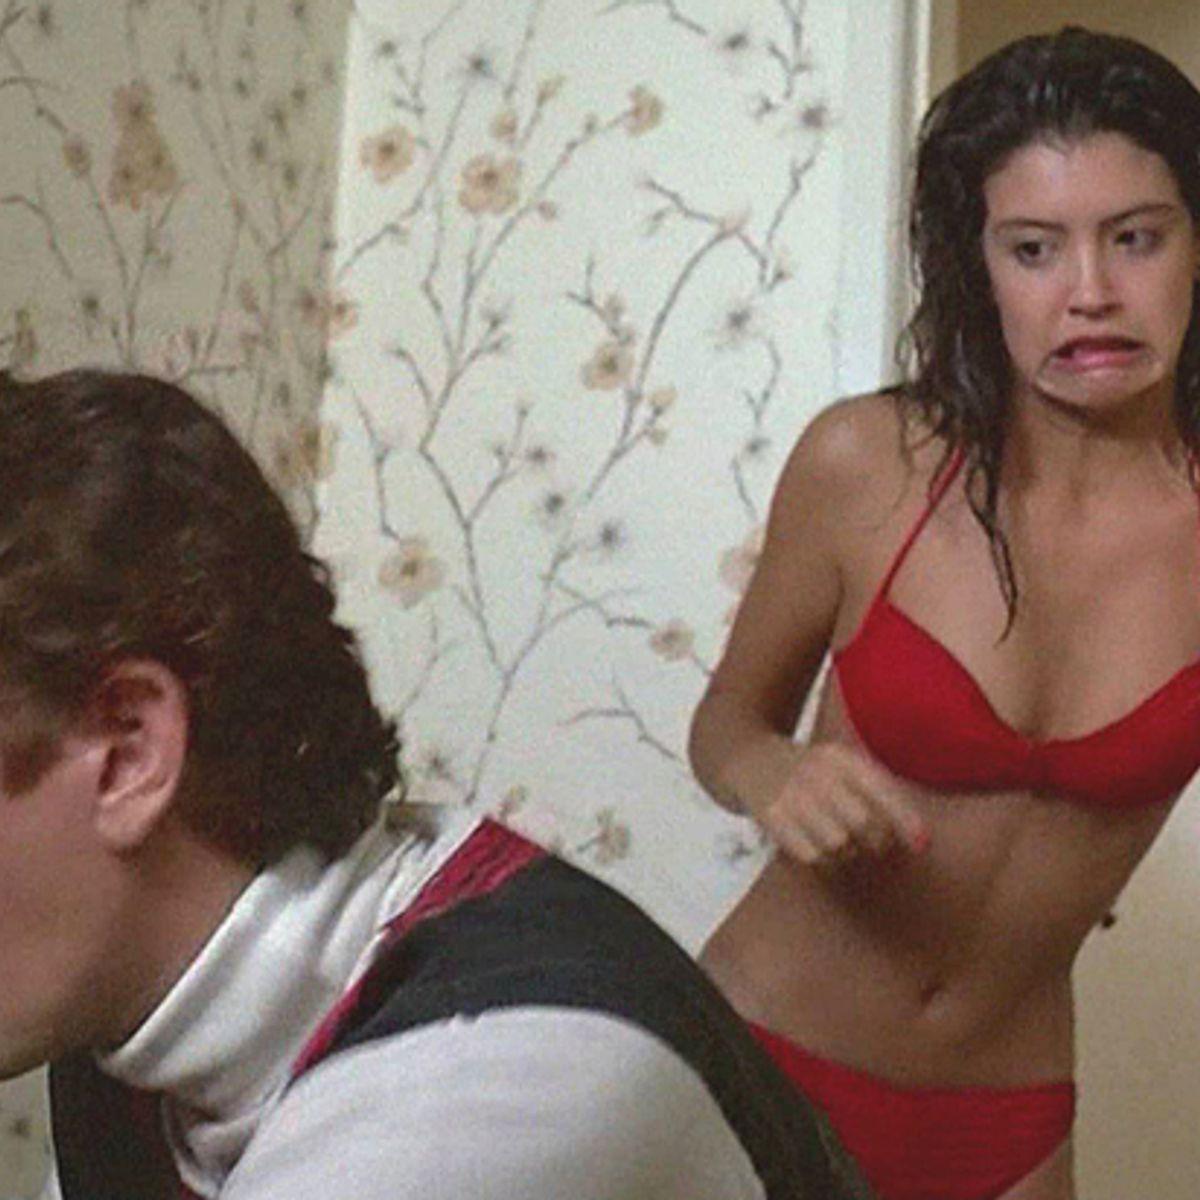 American Pie Band Camp Unrated Scenes the best movie masturbation scenes | salon